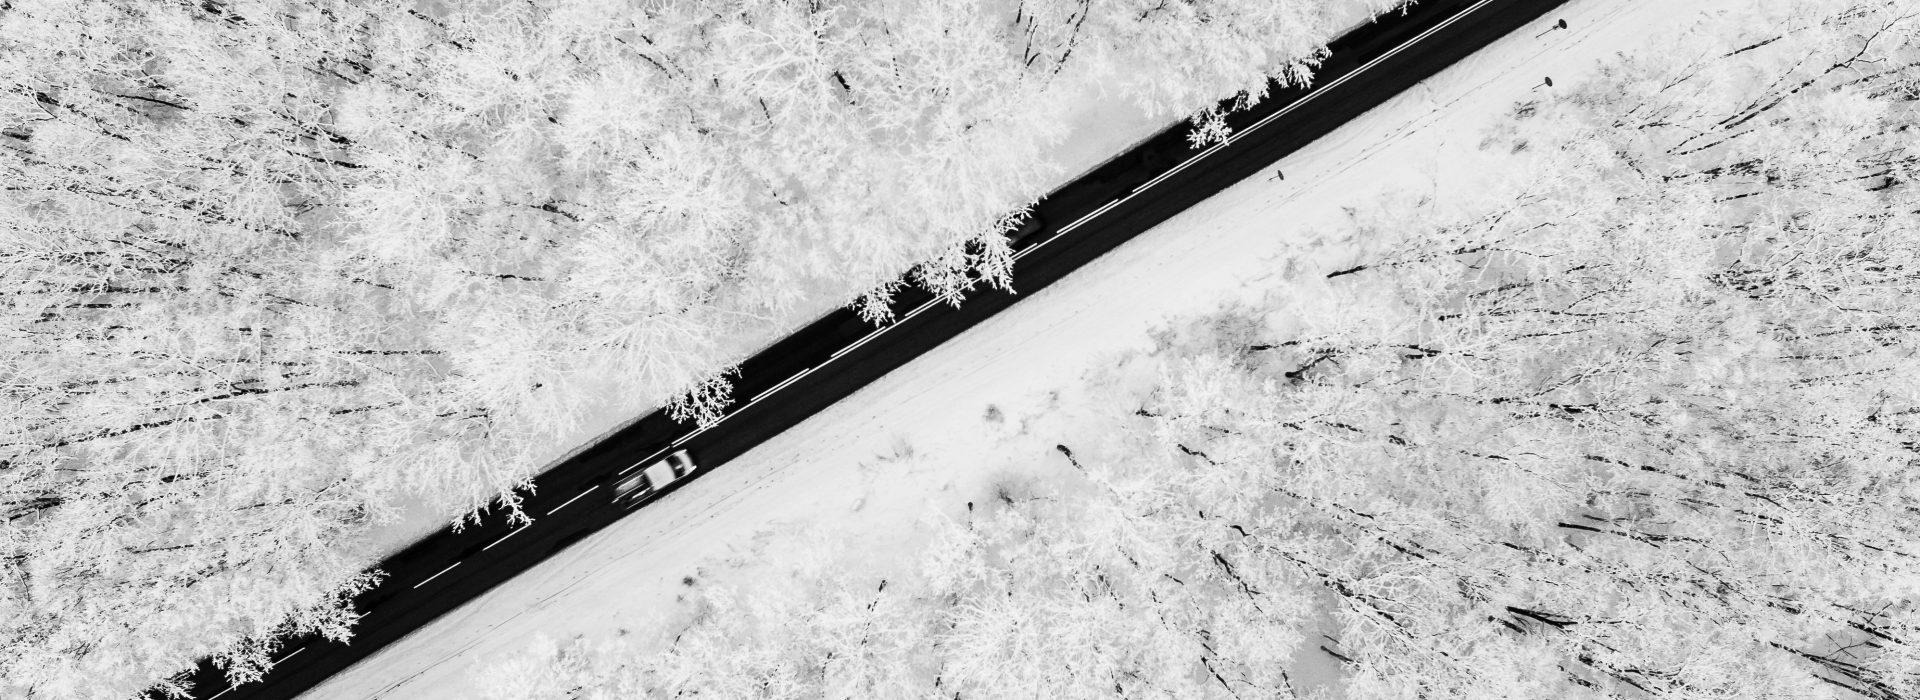 Road running through snowy forest